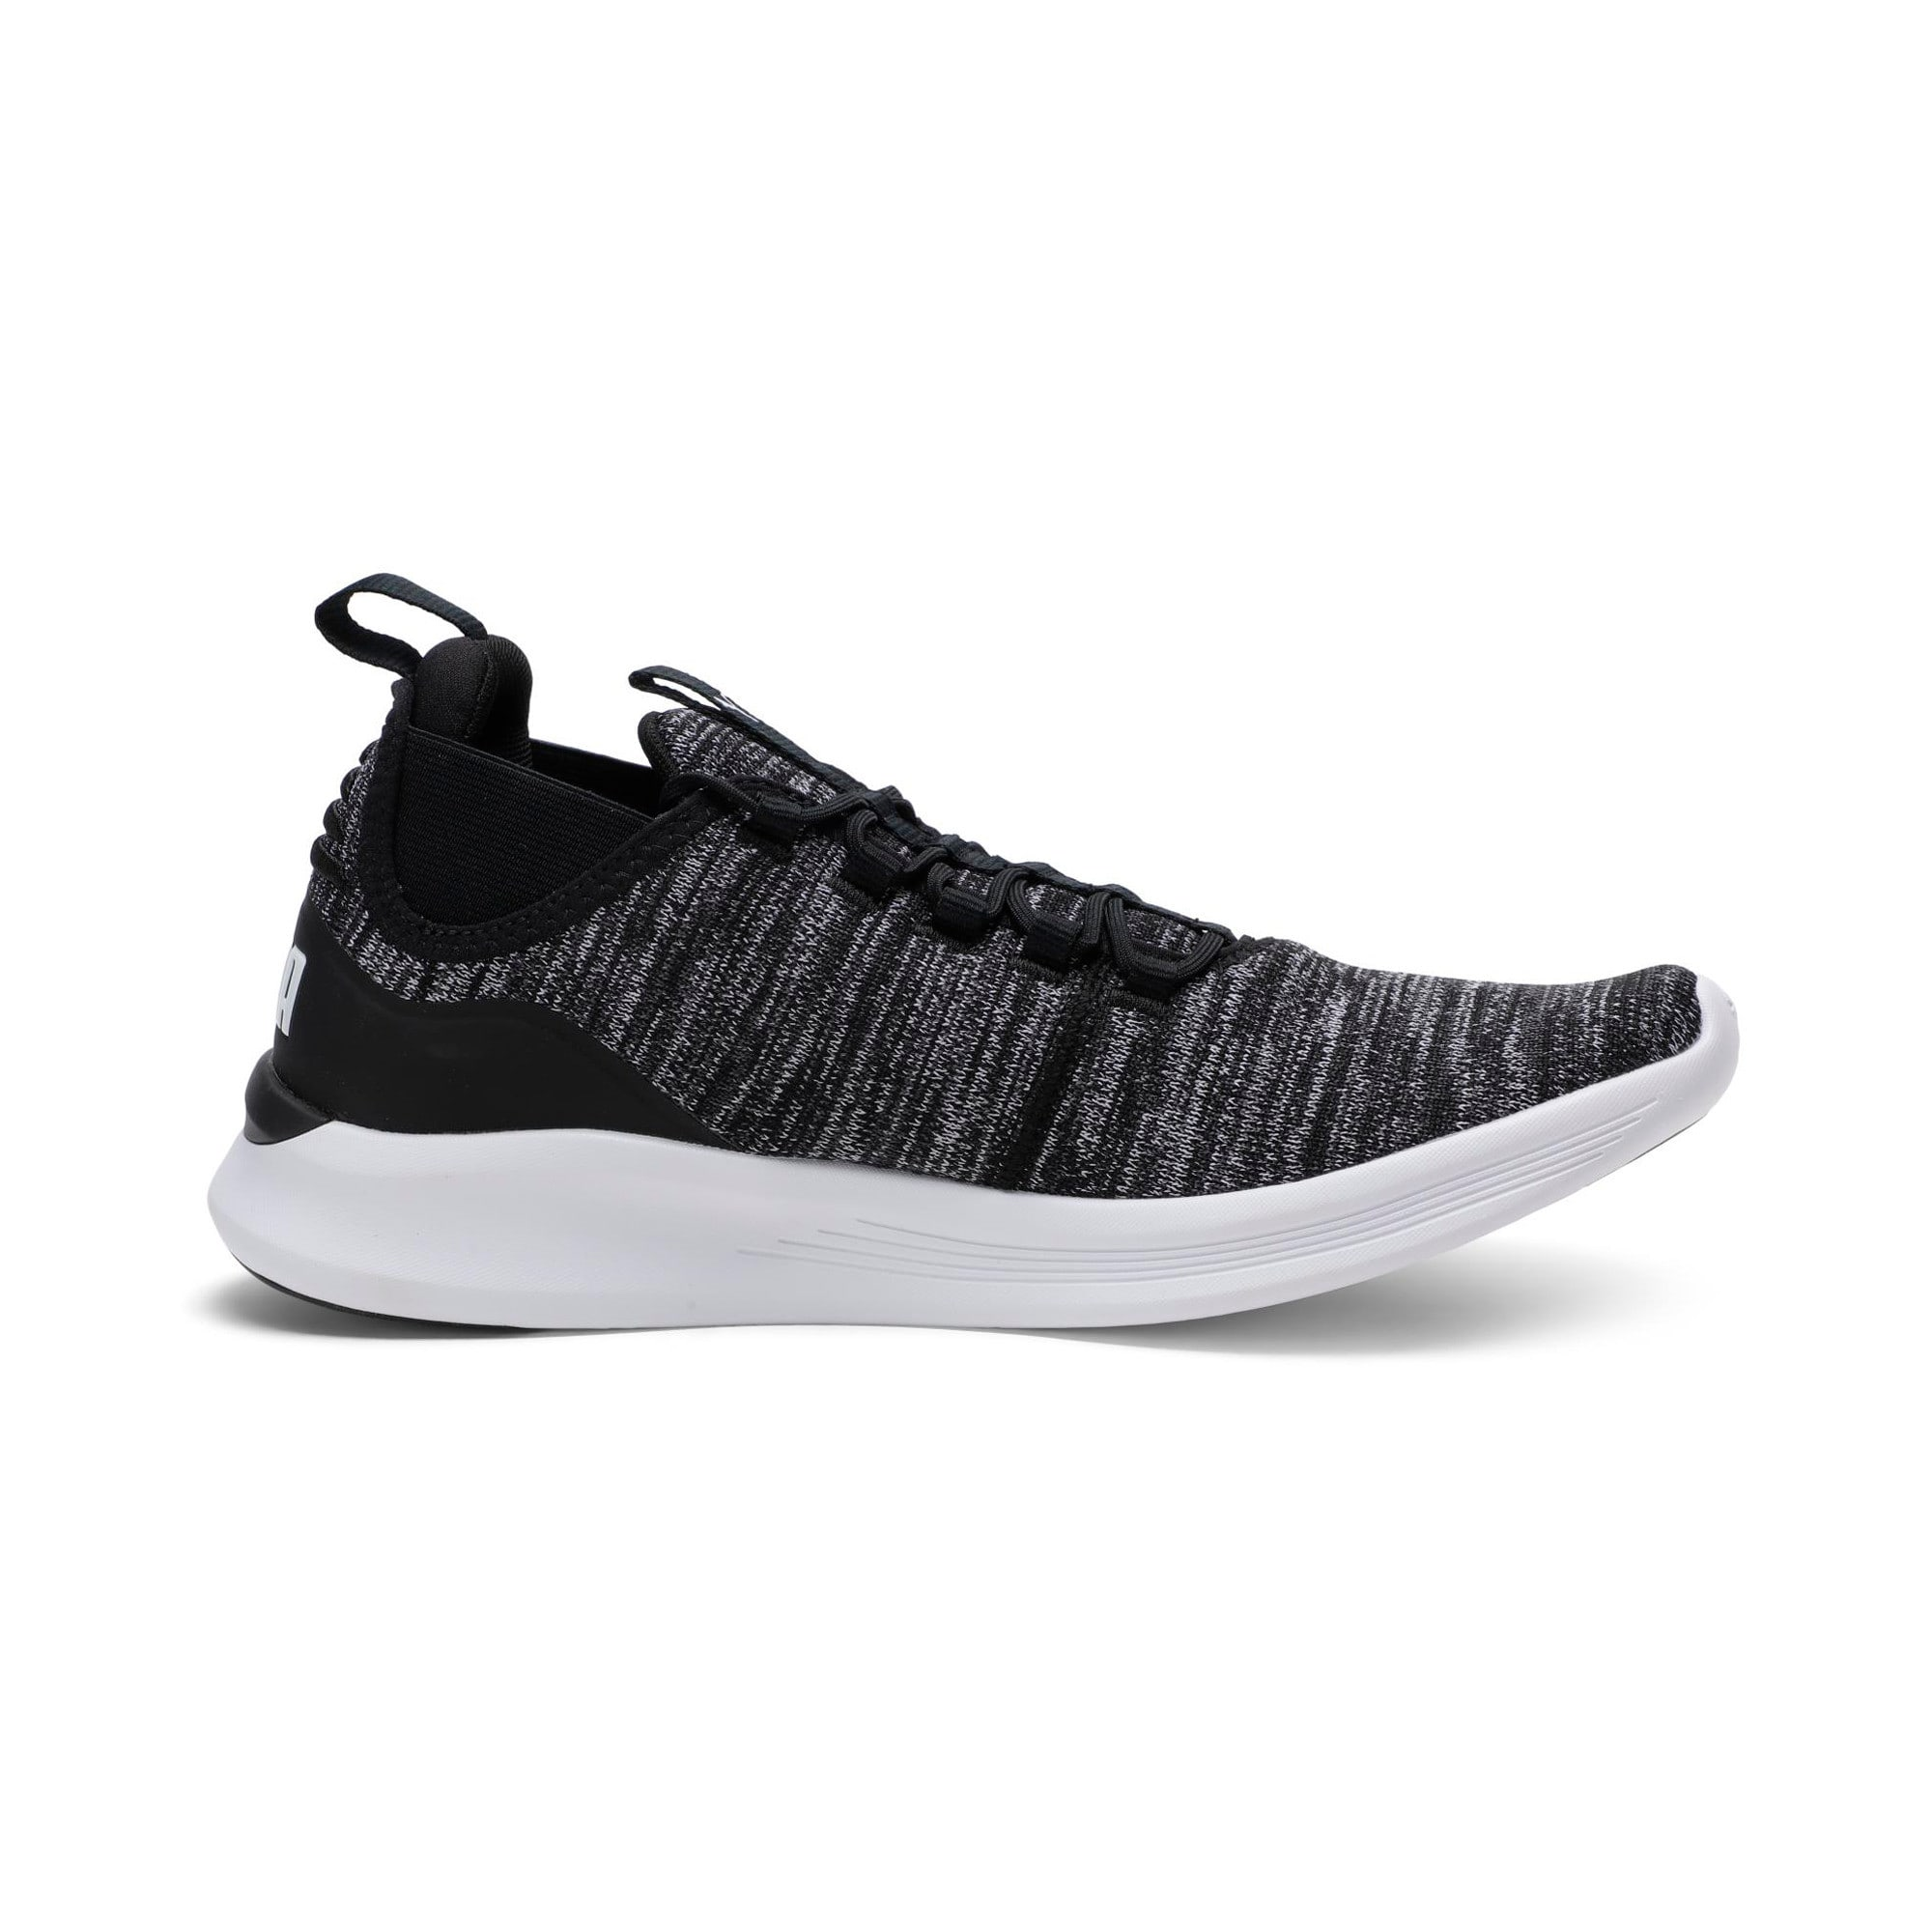 Thumbnail 5 of Flash Daunt Men's Running Shoes, Puma Black-Asphalt- White, medium-IND